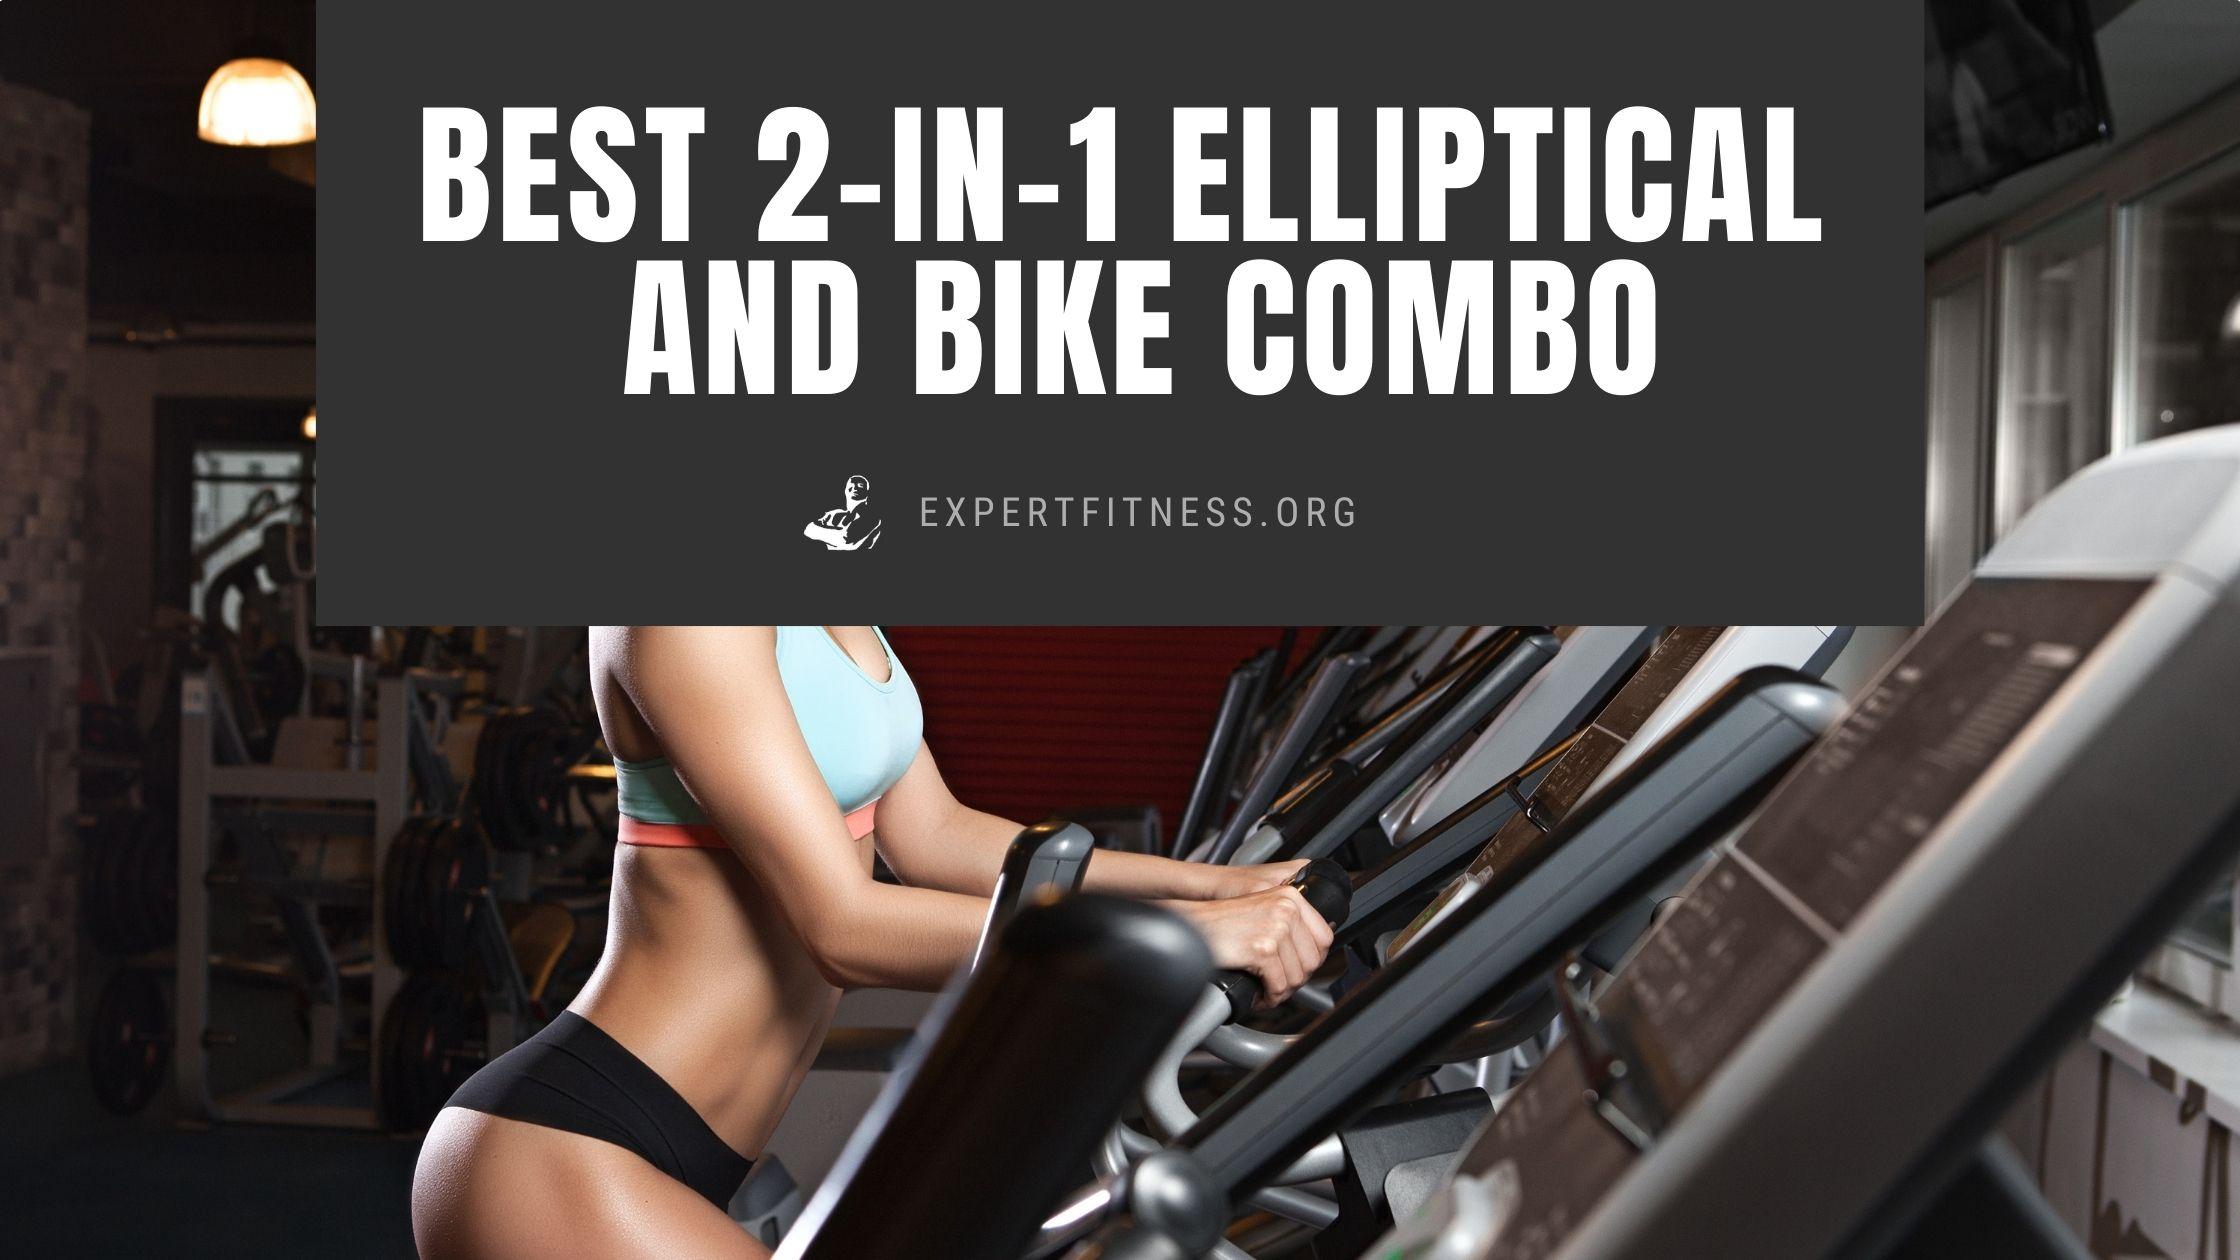 Best 2-in-1 Elliptical and Bike Combo